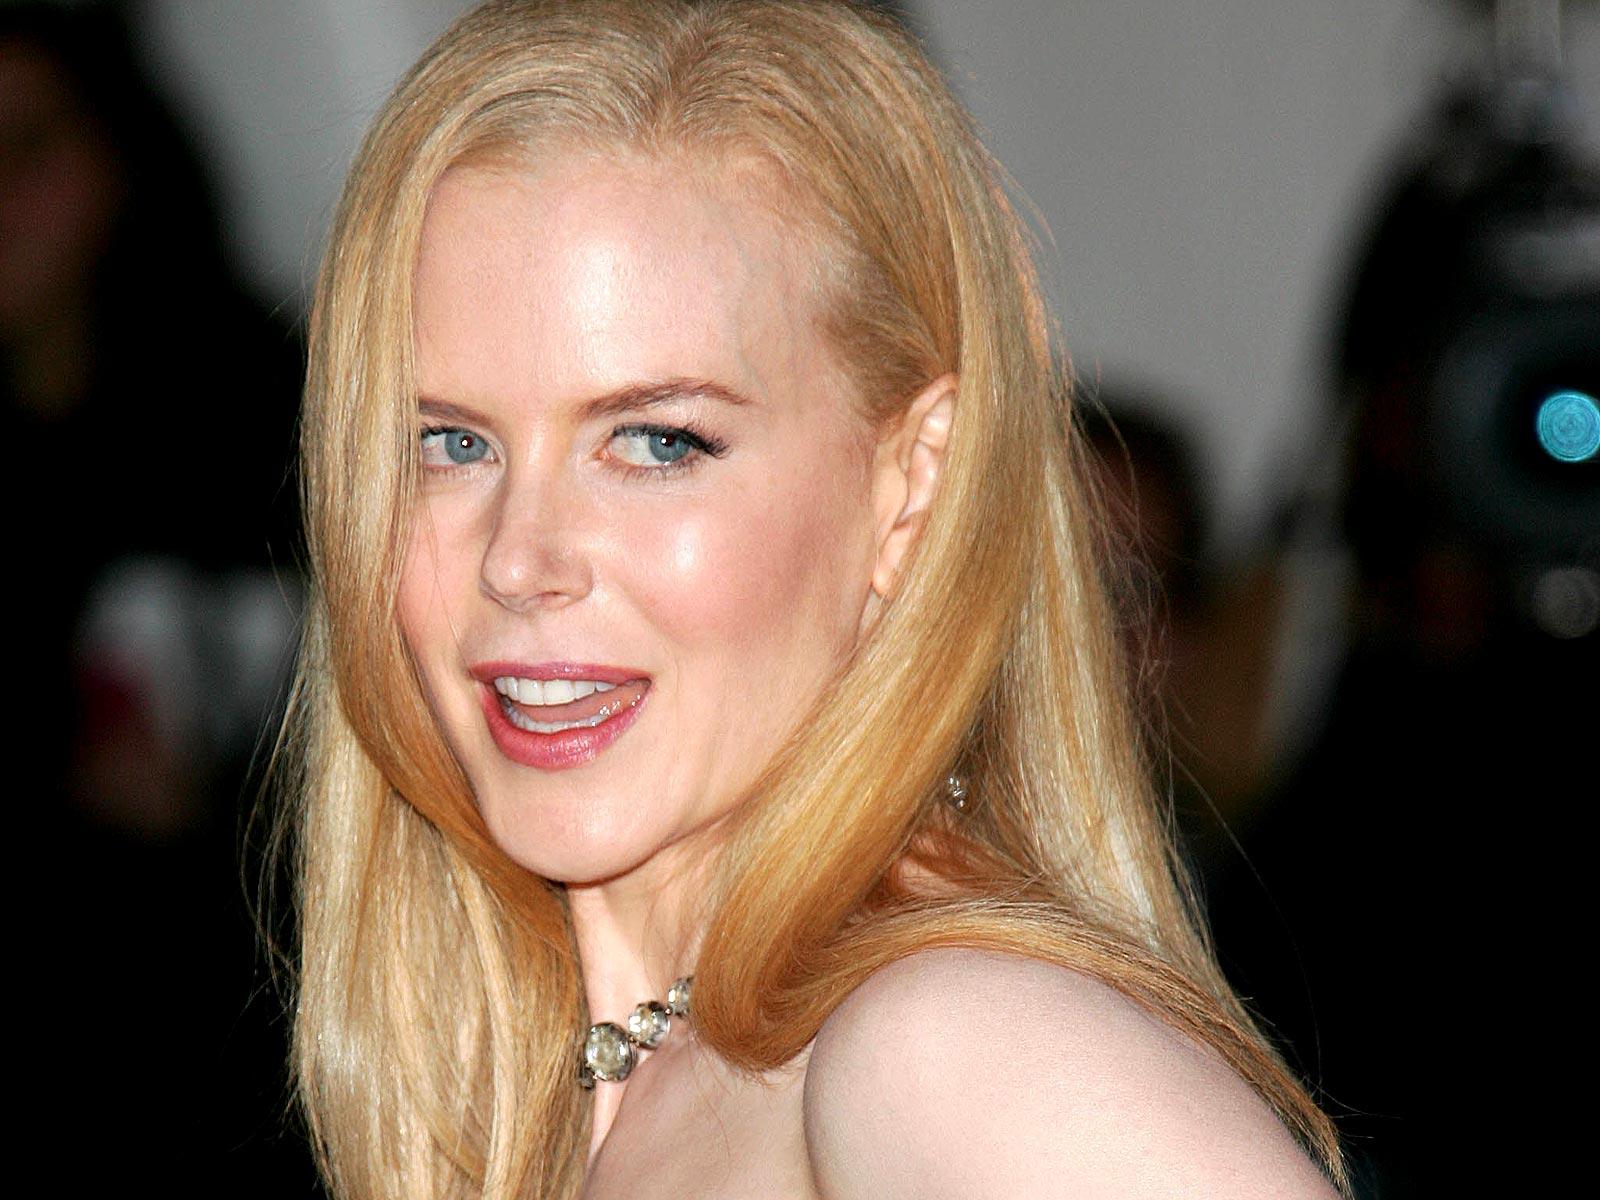 Poze Rezolutie Mare Nicole Kidman  Actor Poza 45 Din 382 CineMagiaro